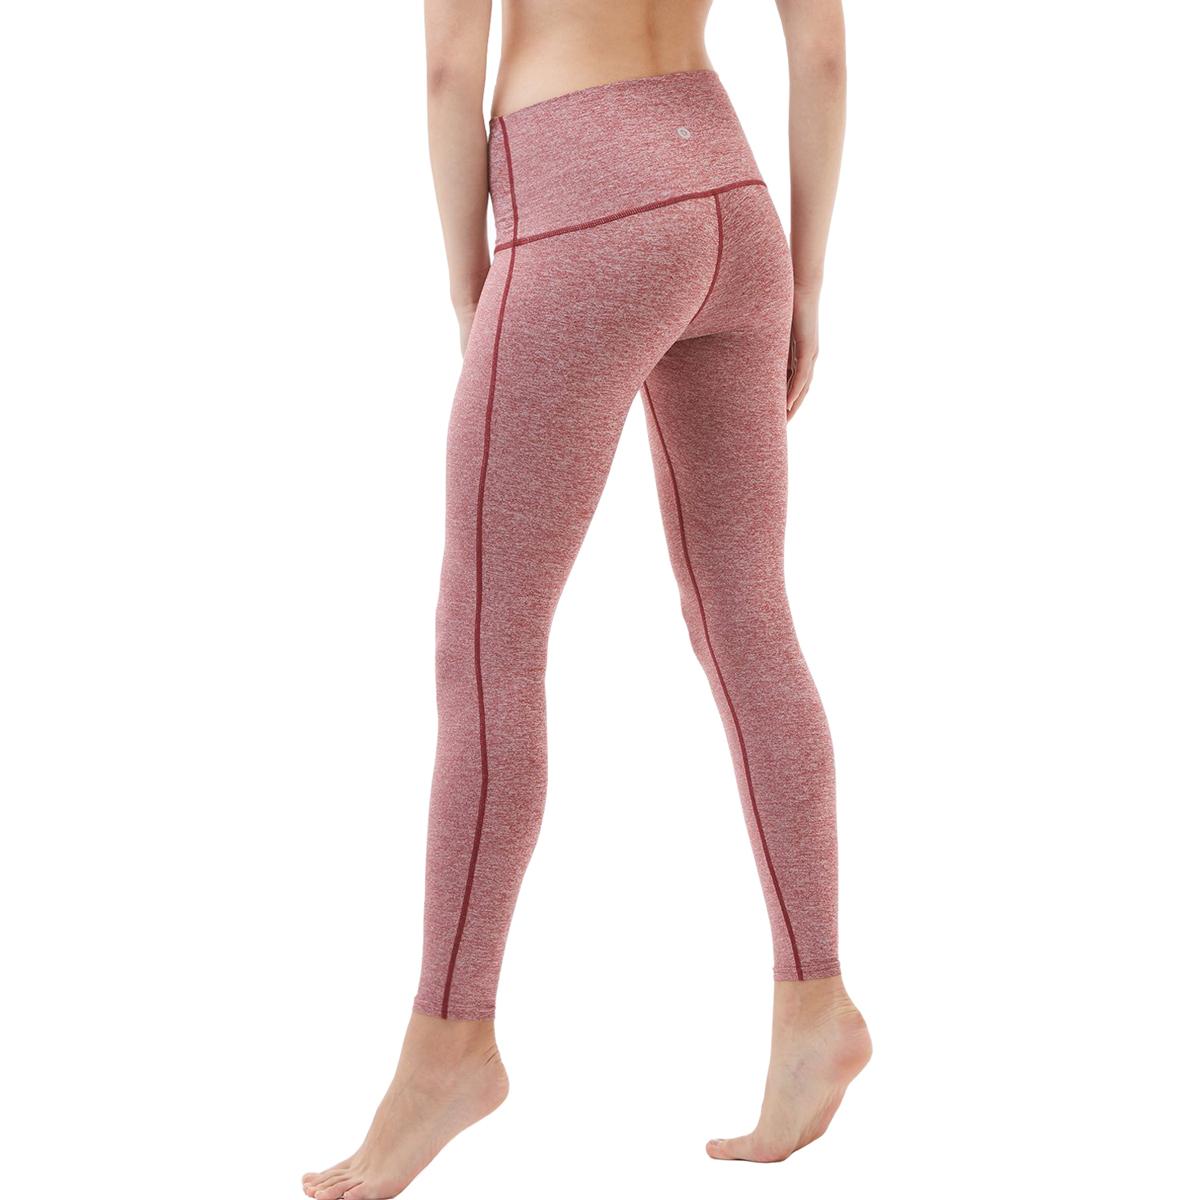 thumbnail 100 - TSLA Tesla FYP42 Women's High-Waisted Ultra-Stretch Tummy Control Yoga Pants